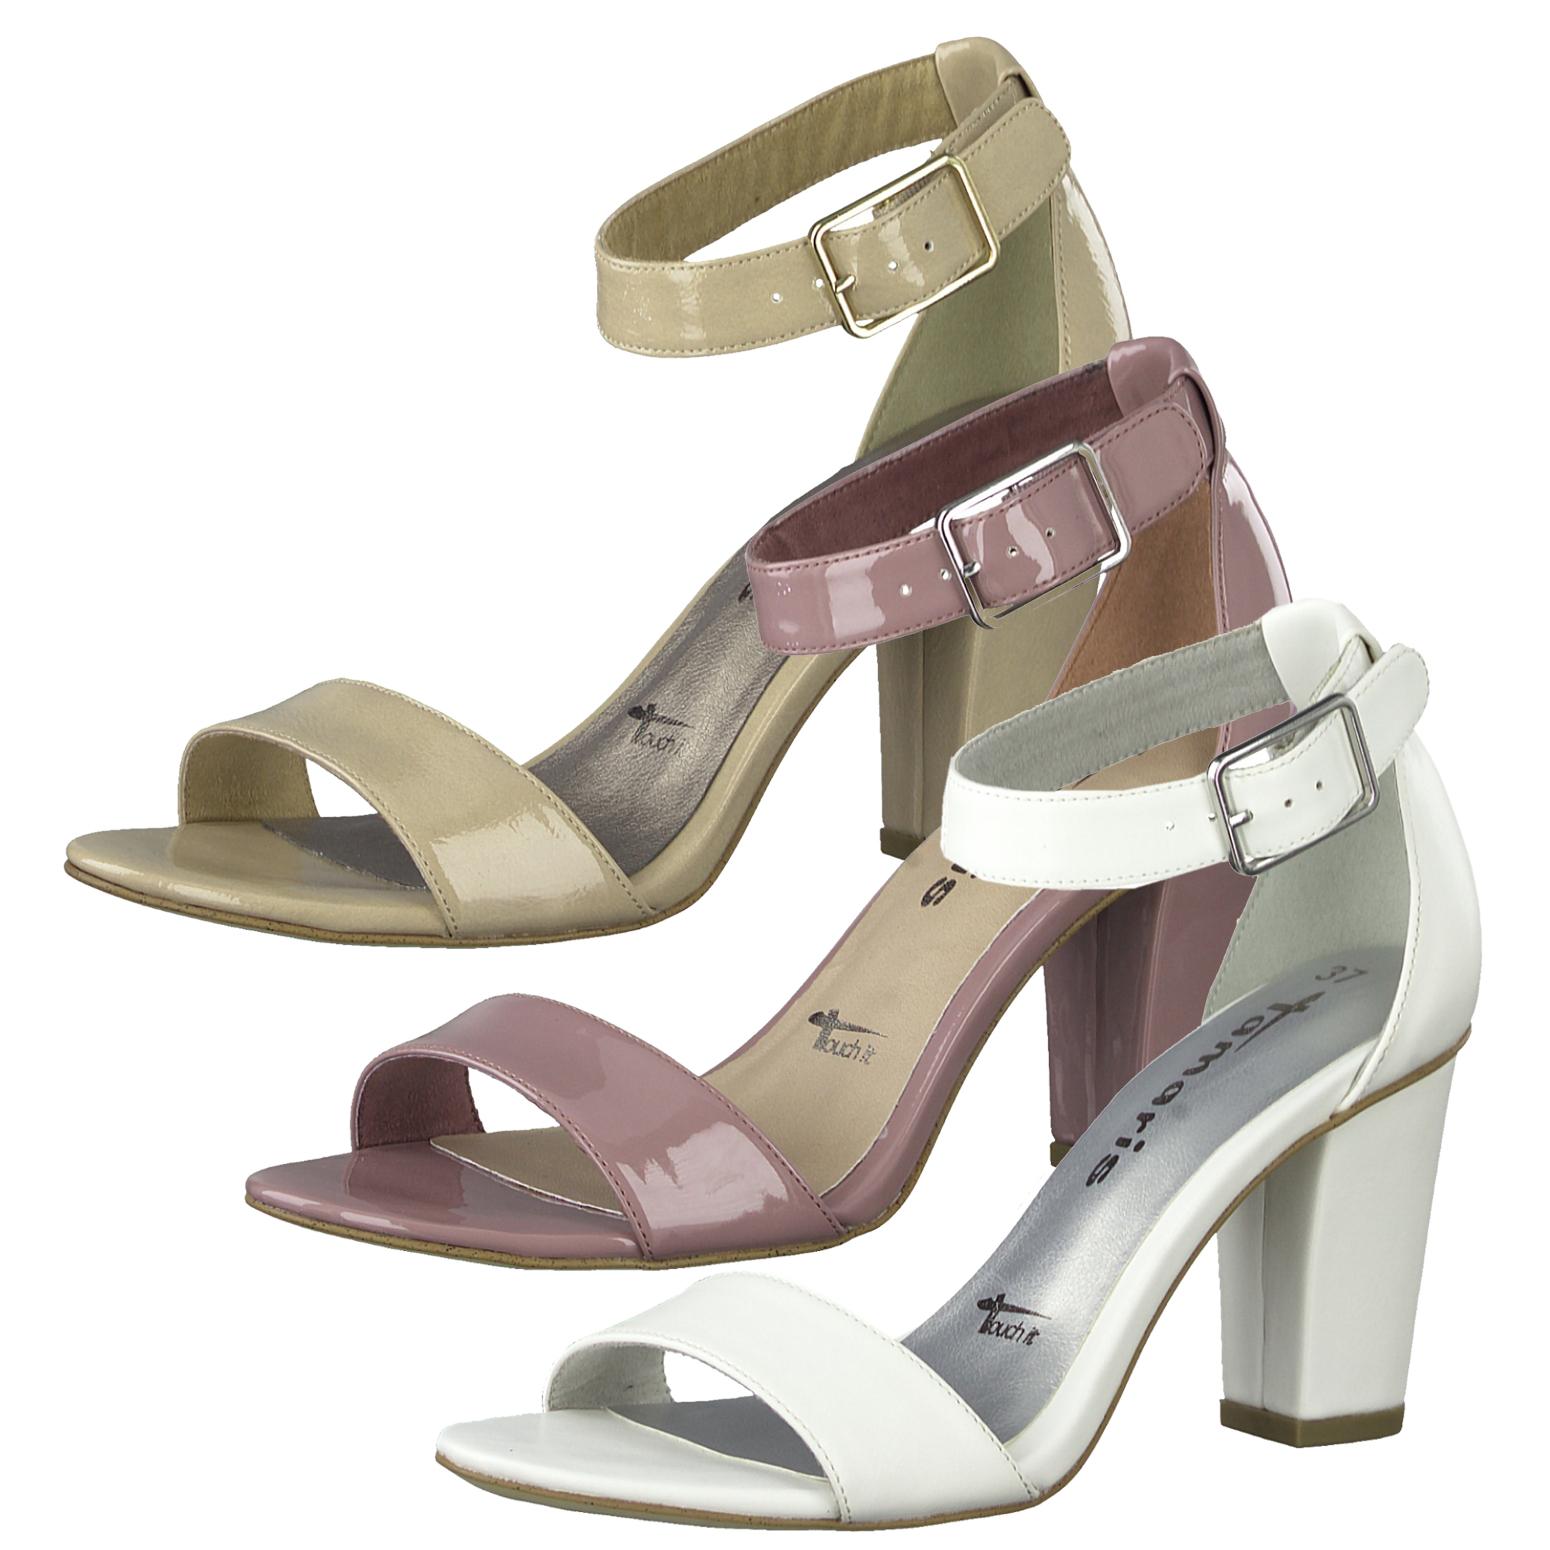 Tamaris 1-28018-22 Sandaletten Fesselriemen Blockabsatz